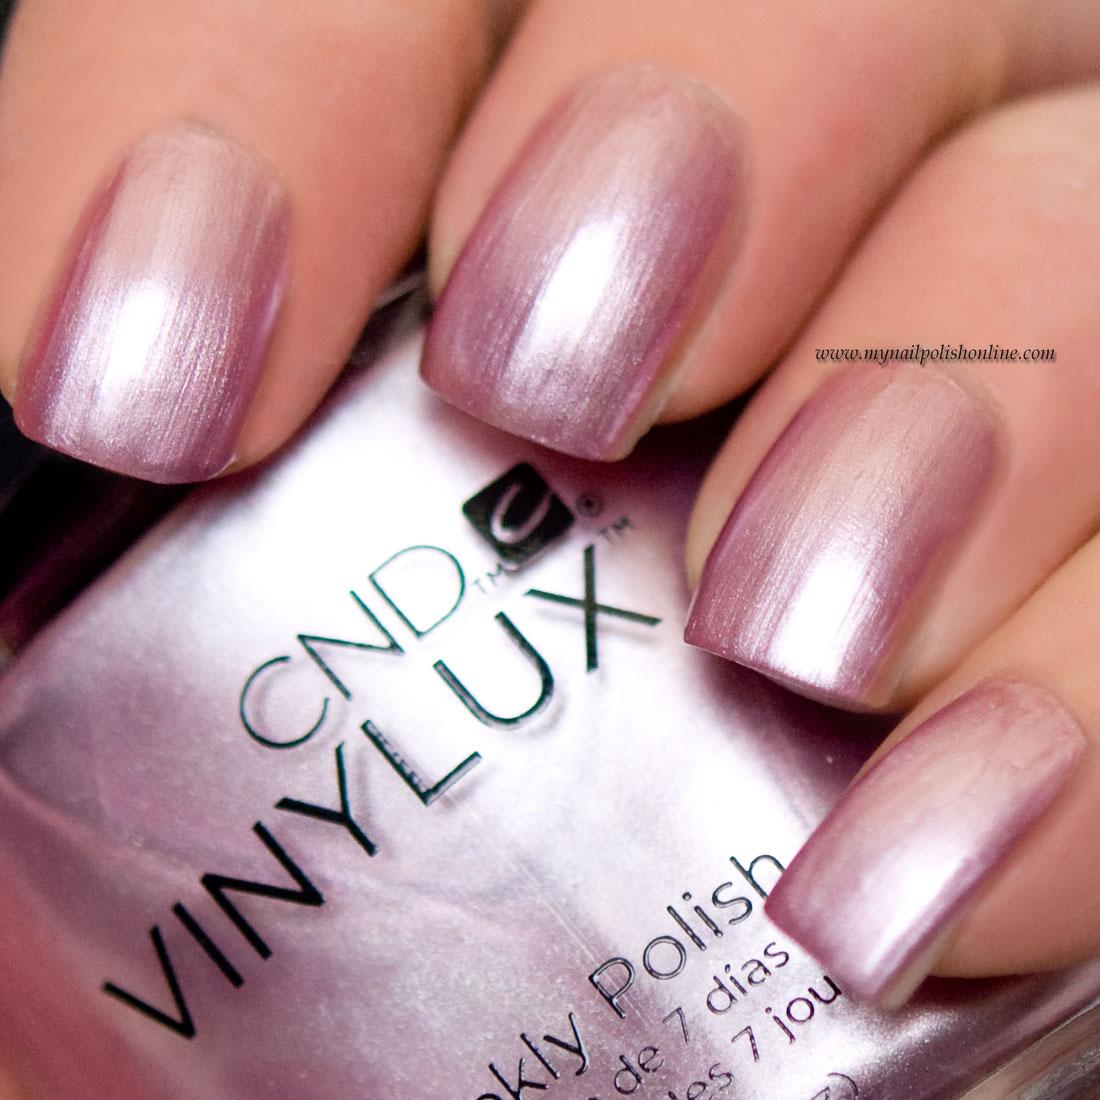 Cnd Vinylux Tundra My Nail Polish Online